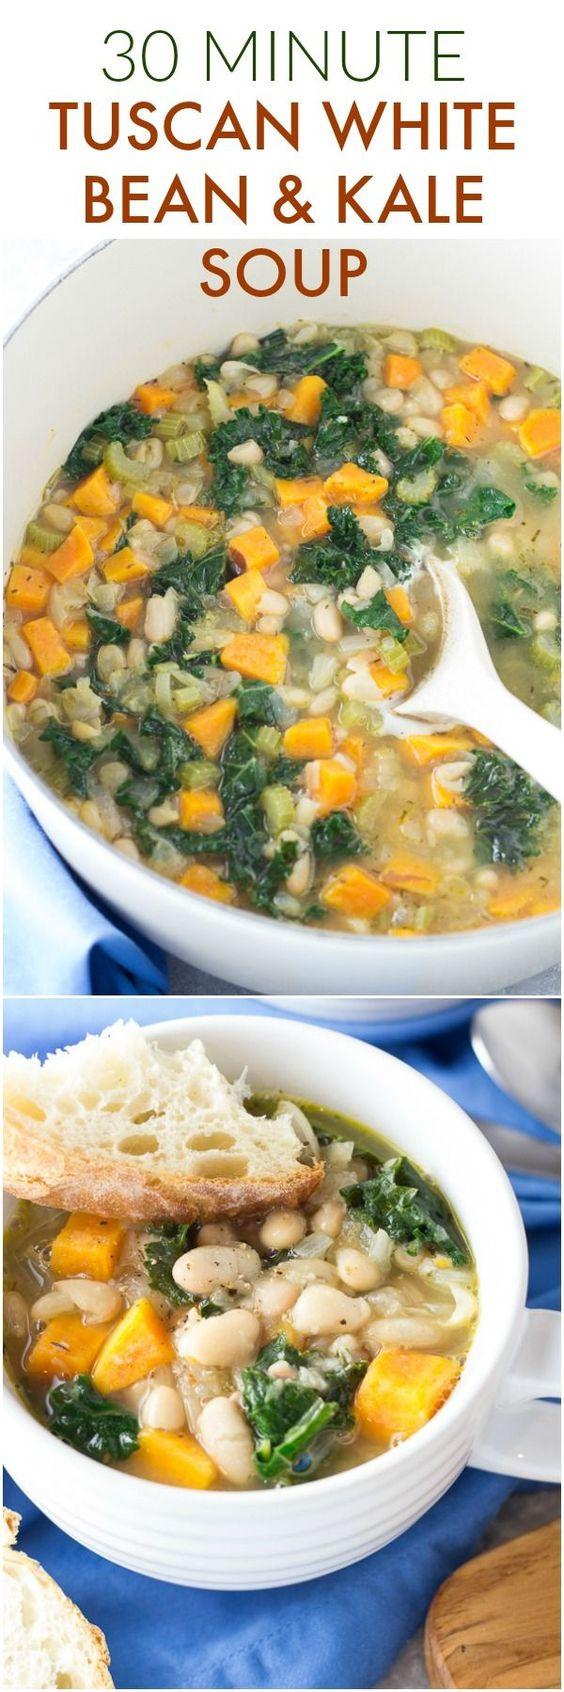 30 Minute Tuscan White Bean and Kale Soup | Recipe | Kale Soup, White ...